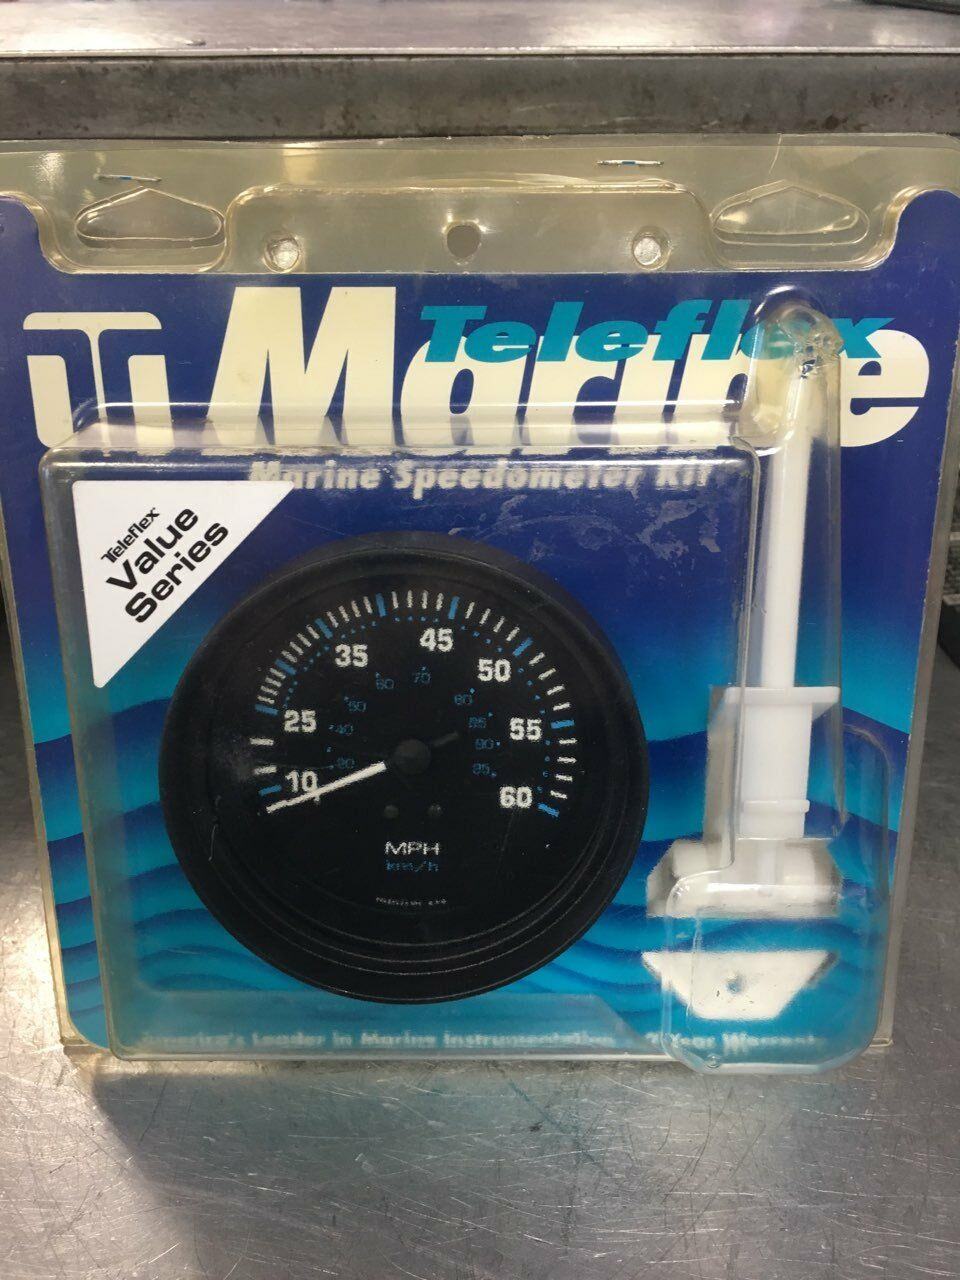 TELEFLEX MARINE SPEEDO KIT #56929P BLACK 10-60 MPH Includes Speedo Gauge/Pickup